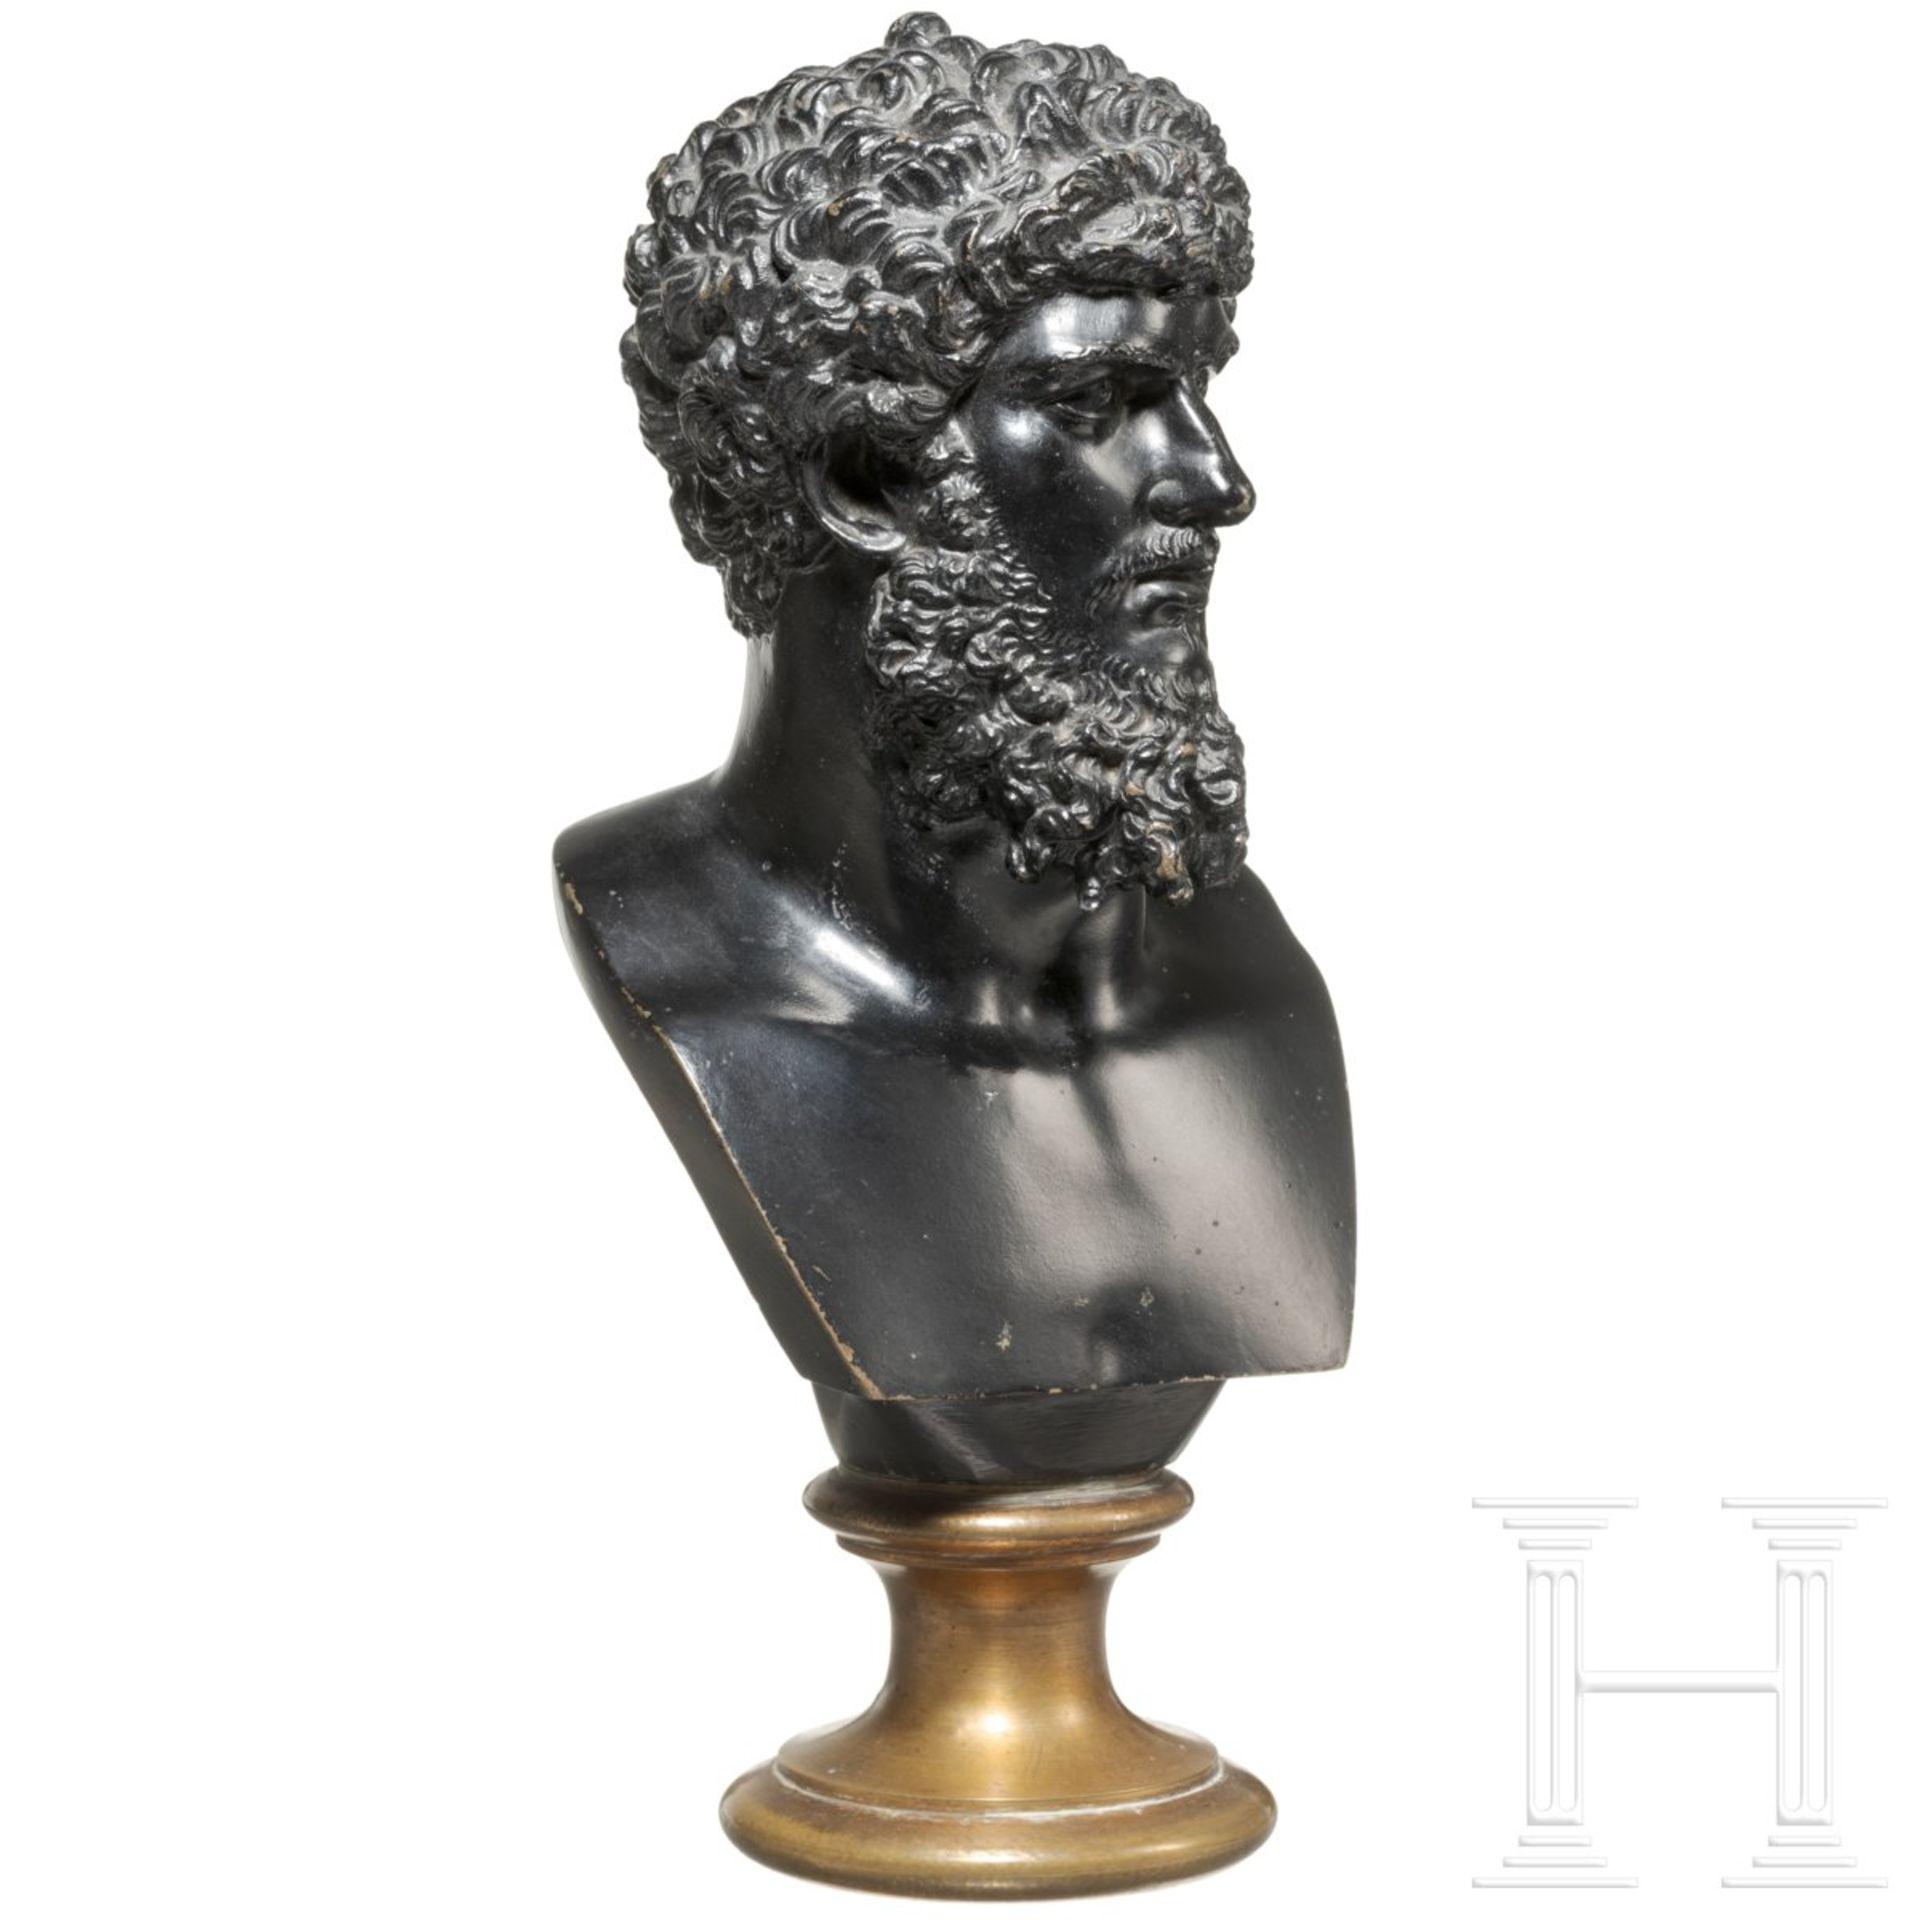 Bronzebüste des Kaisers Lucius Verus - Image 2 of 4